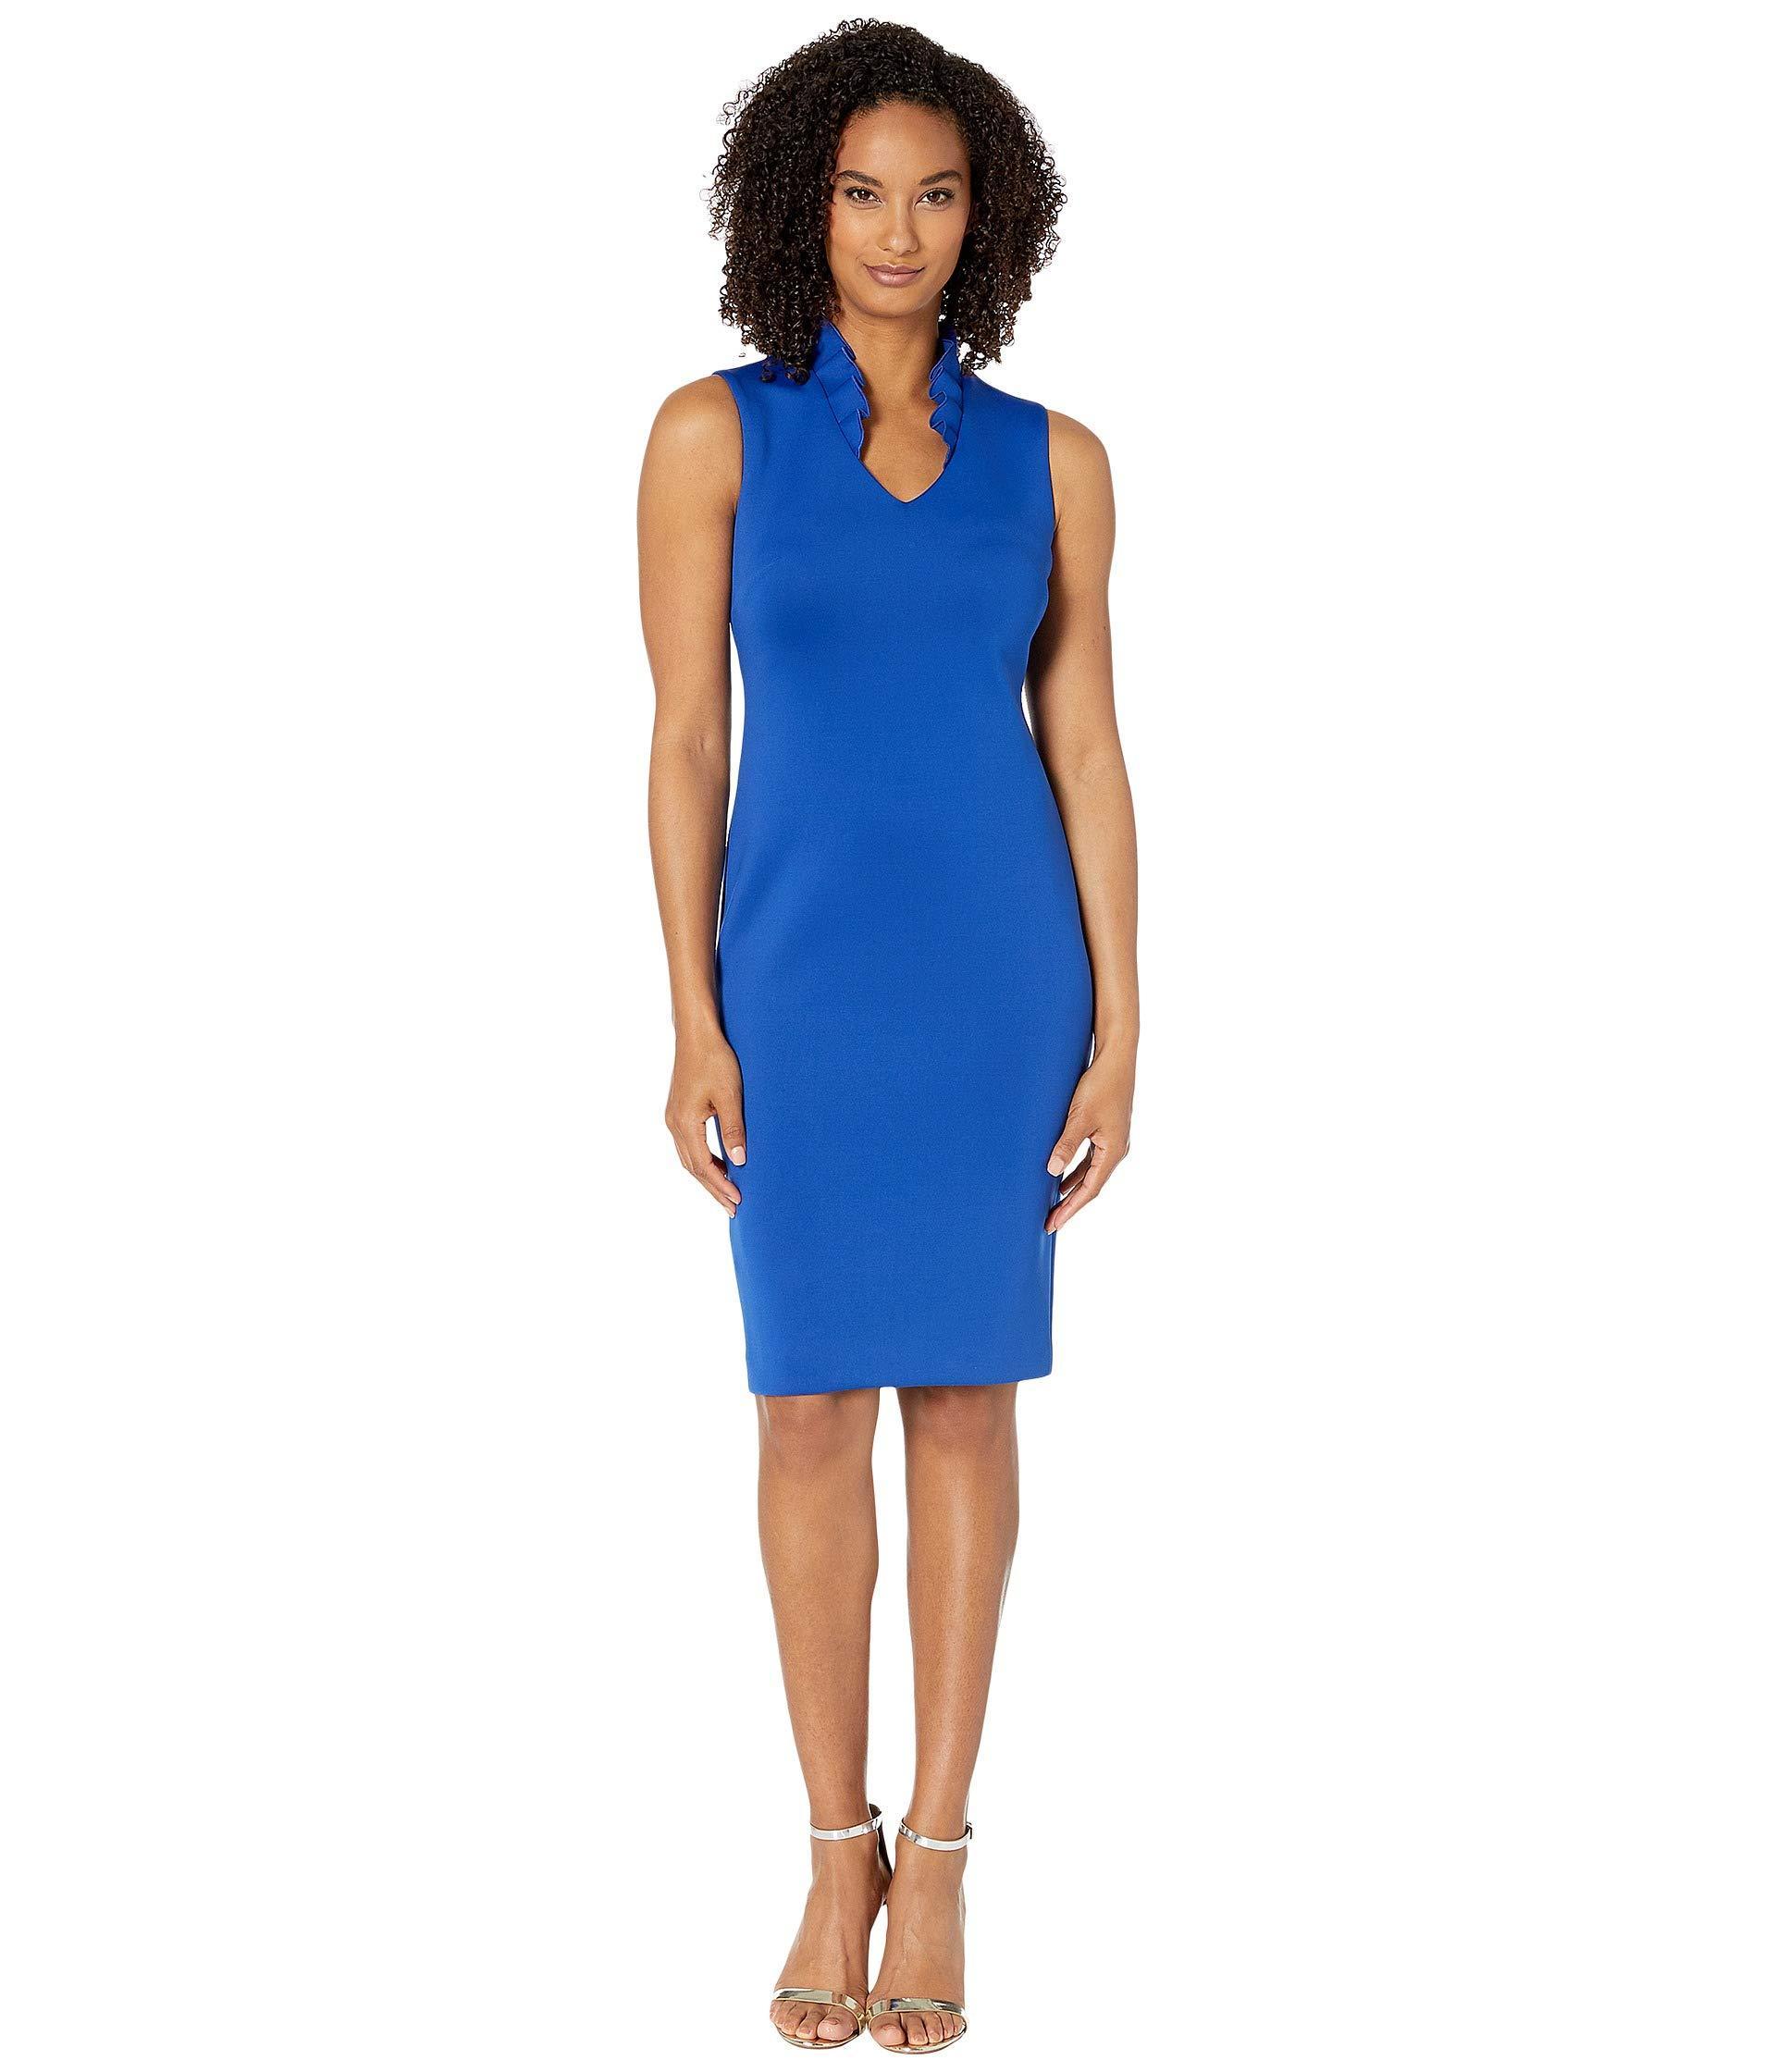 8475f251 Lyst - Calvin Klein Ruffle Neck Sheath Dress (black) Women's Dress ...